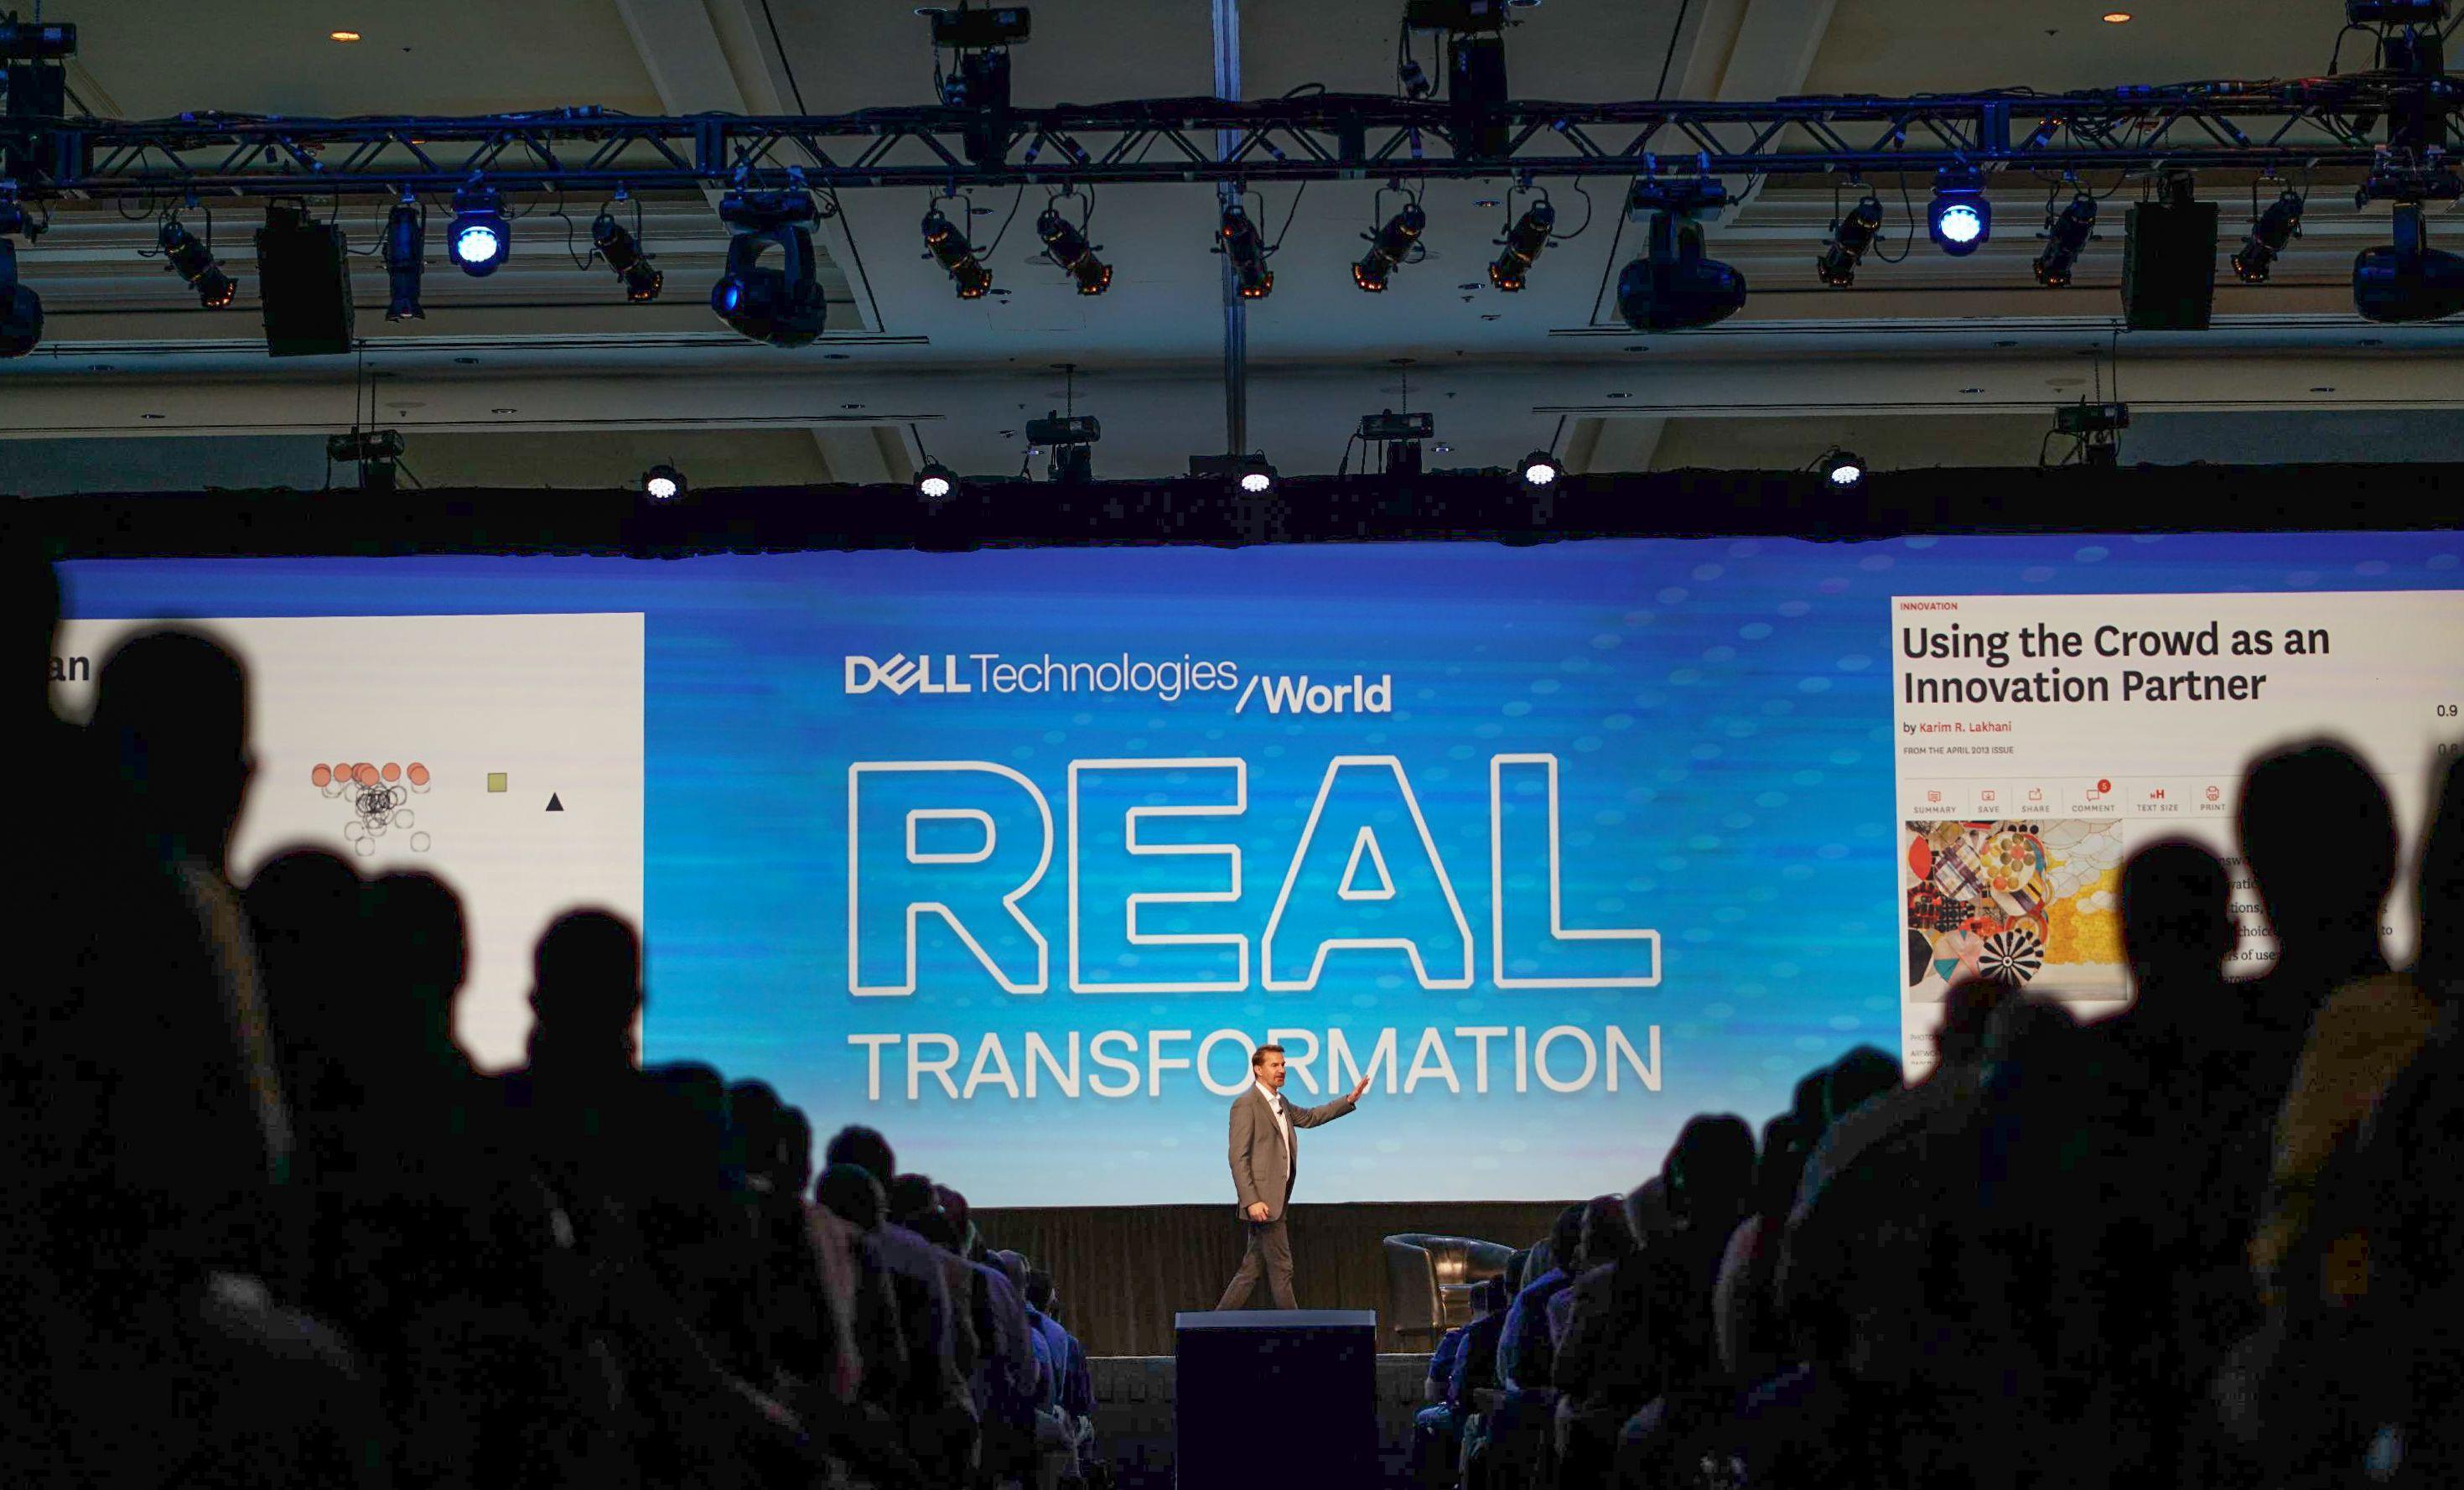 Photo credit: Dell Technologies